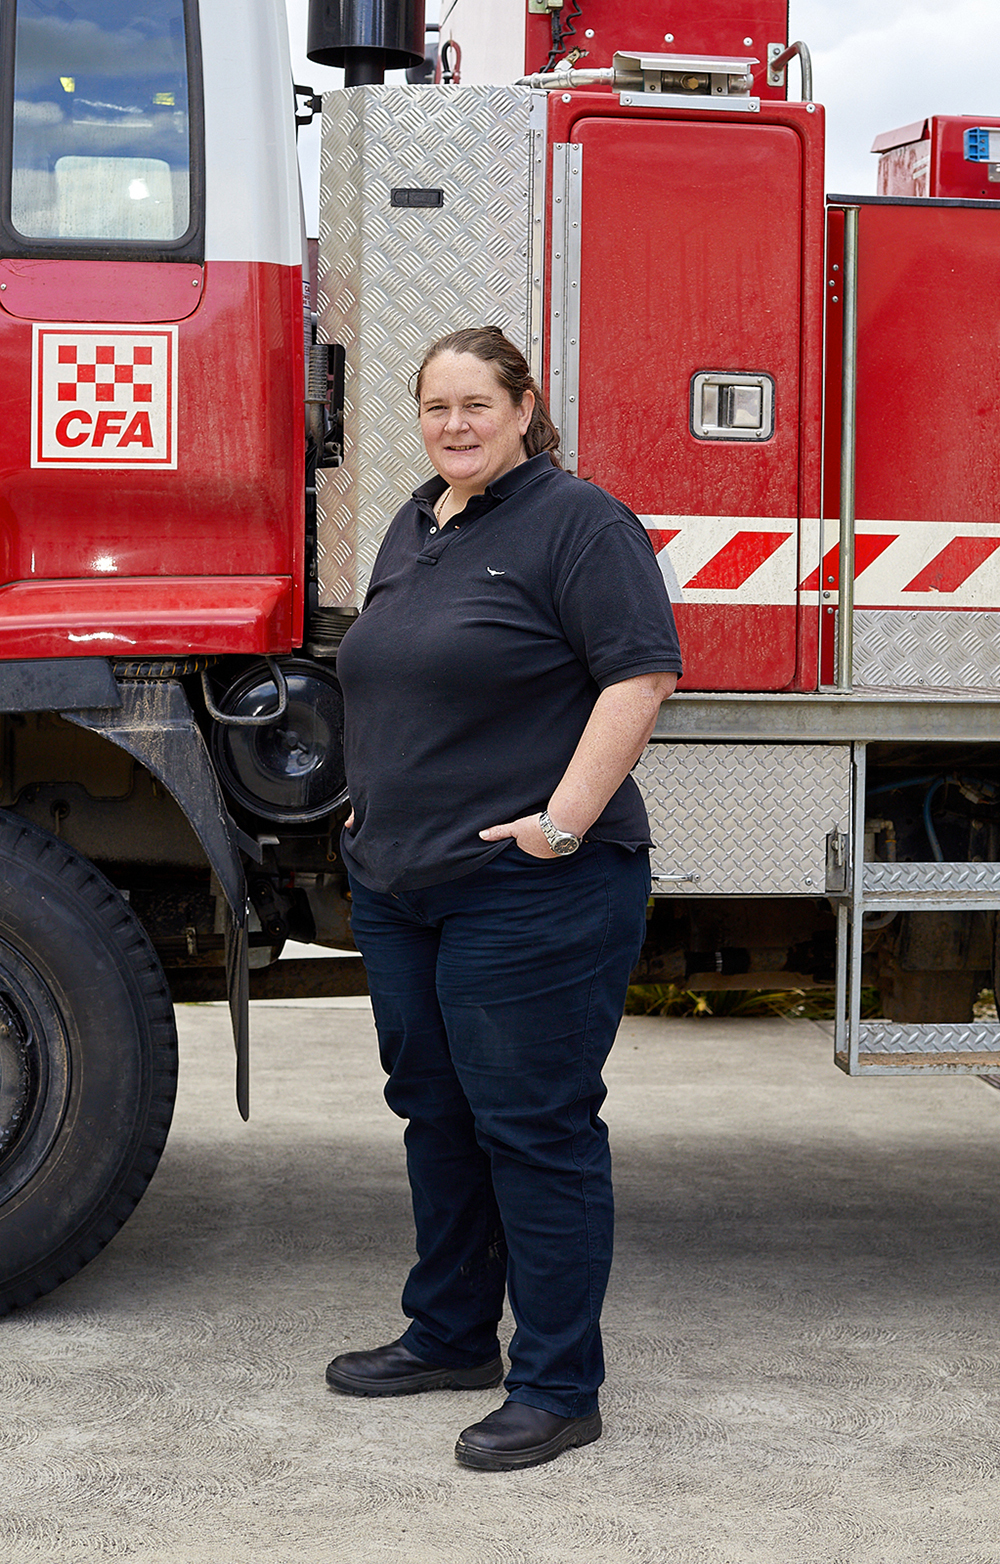 Kate Hodge, CFA volunteer. Portrait Photography // Peter Plozza